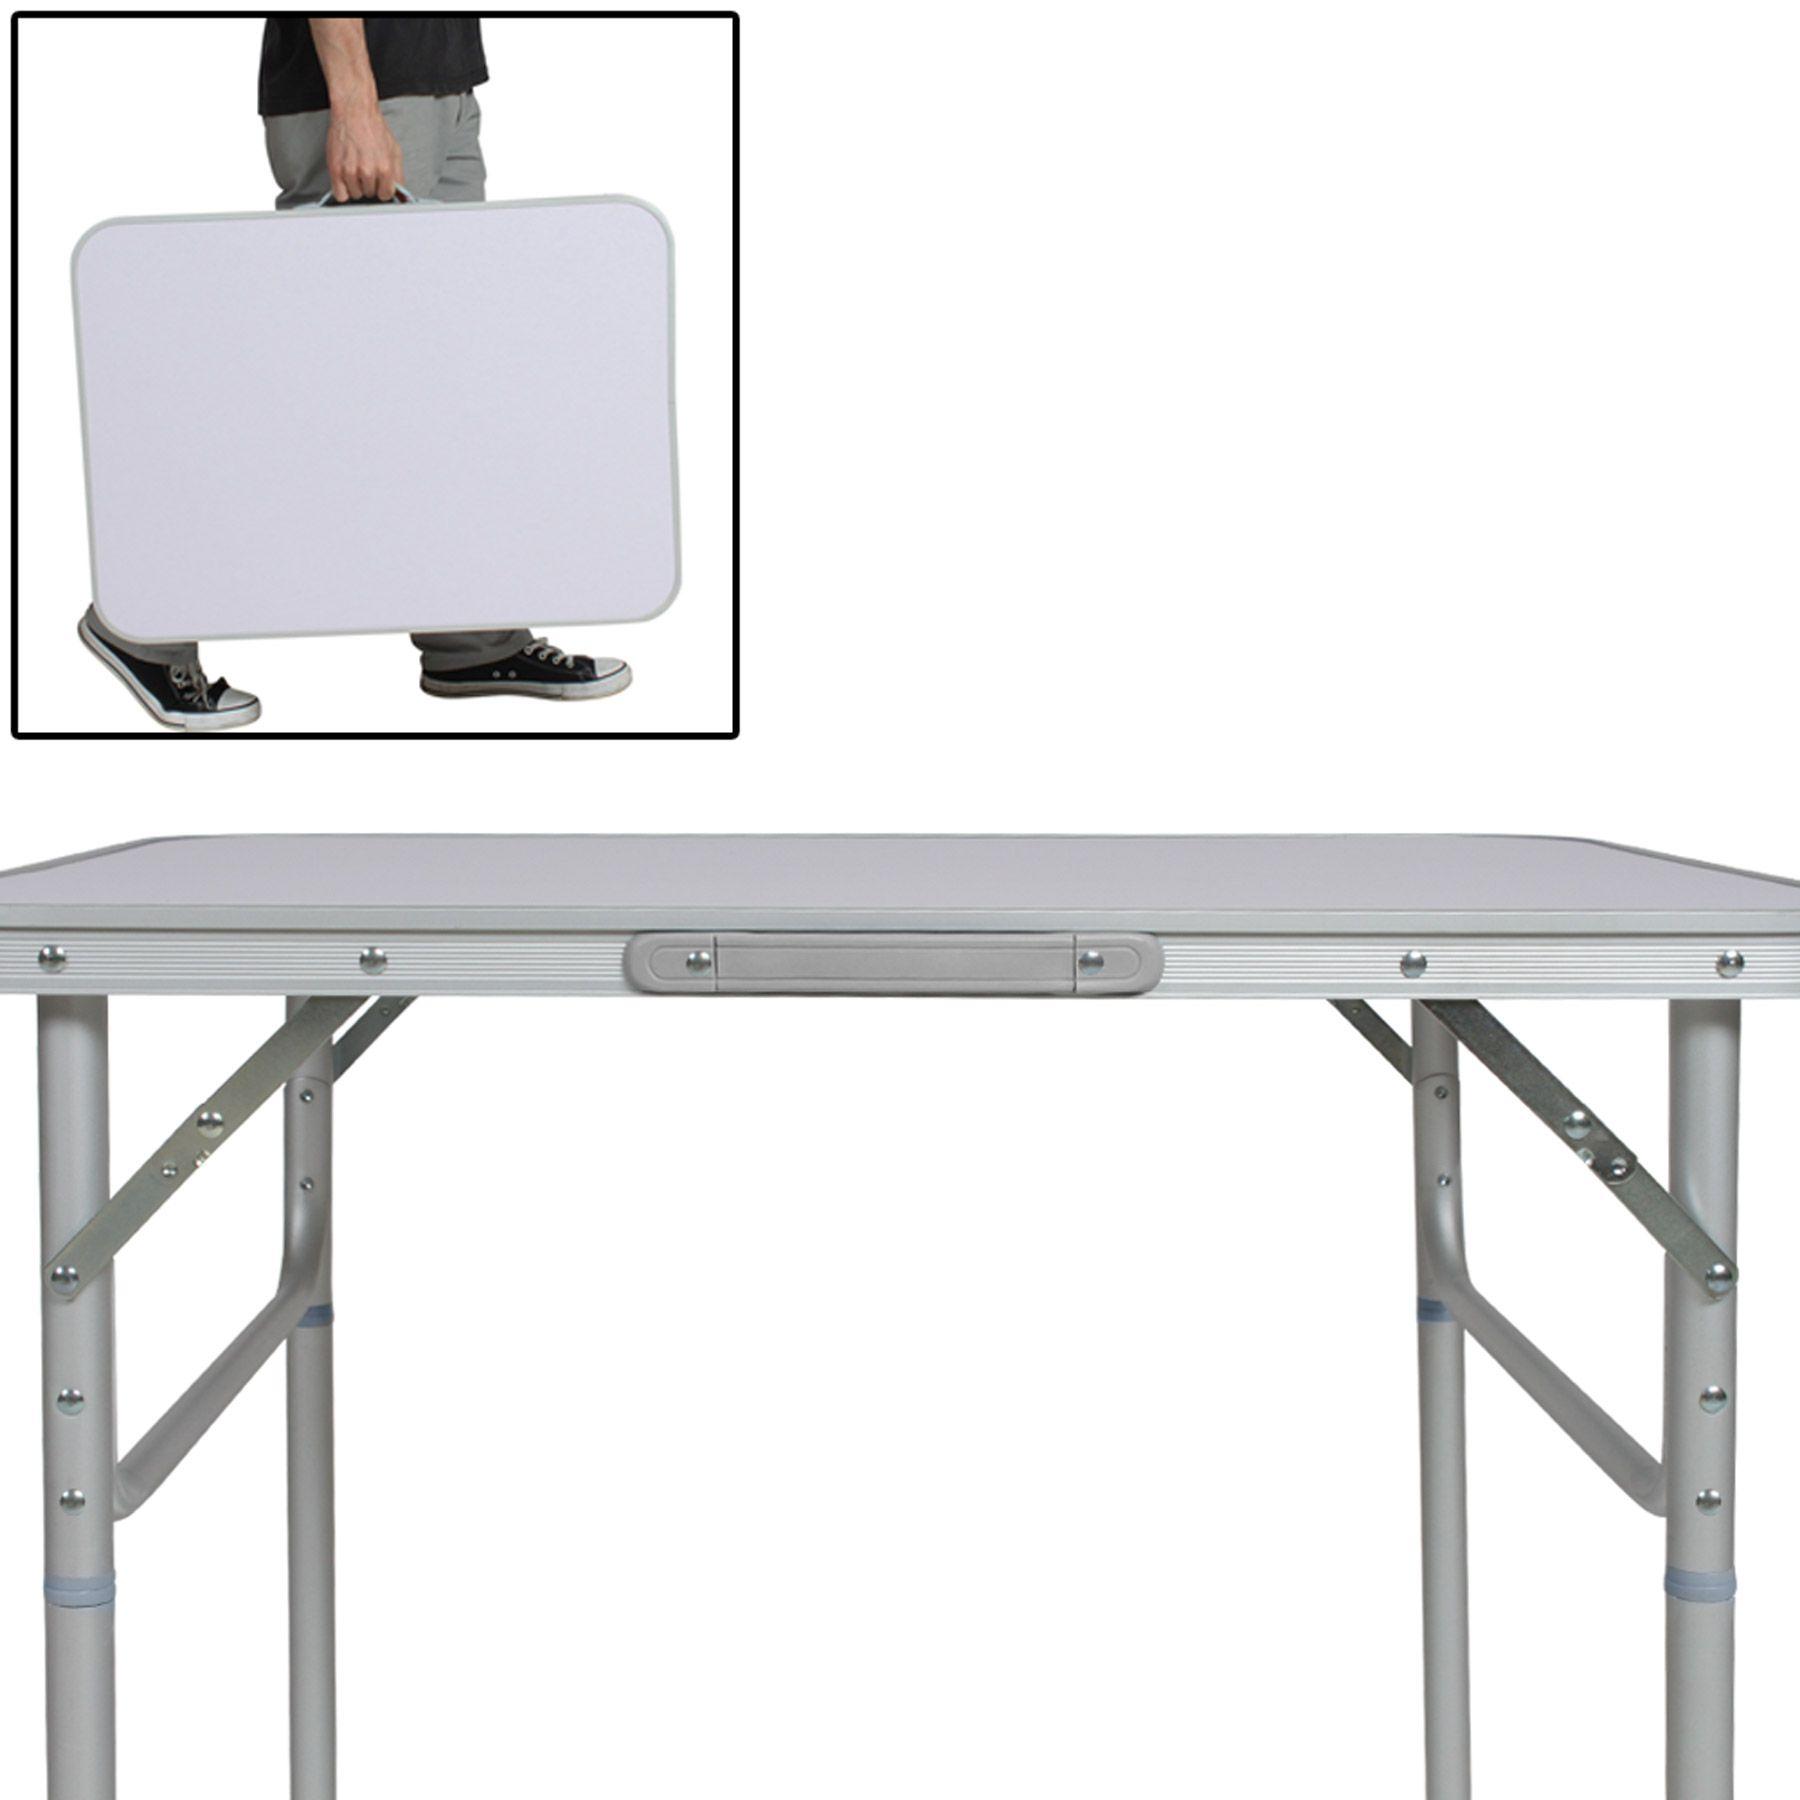 table pliante de camping jardin bbq barbecue pique nique. Black Bedroom Furniture Sets. Home Design Ideas